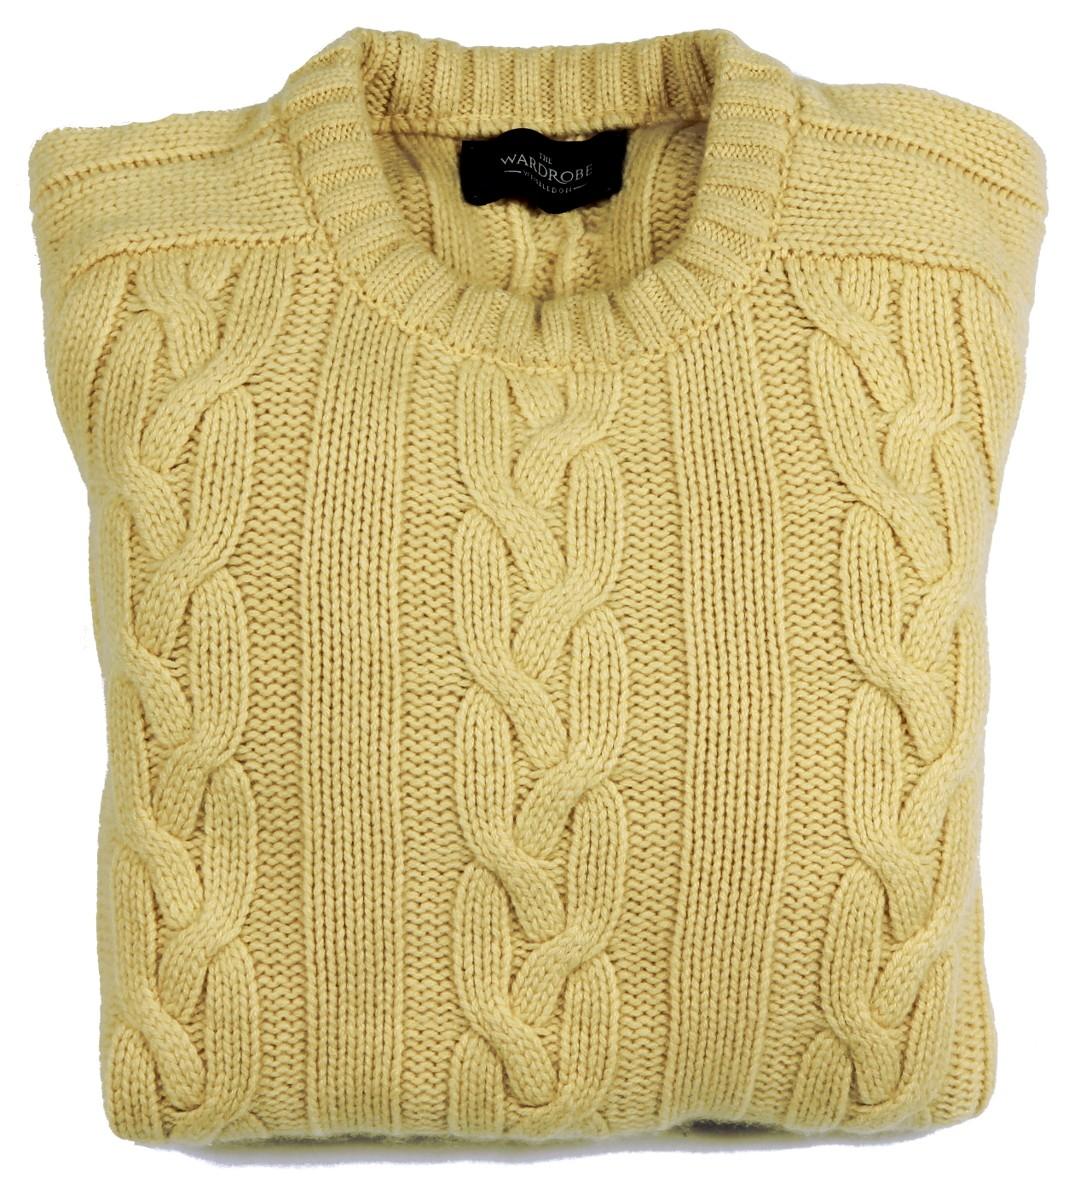 The Wardrobe Sweater: Small Pale Yellow